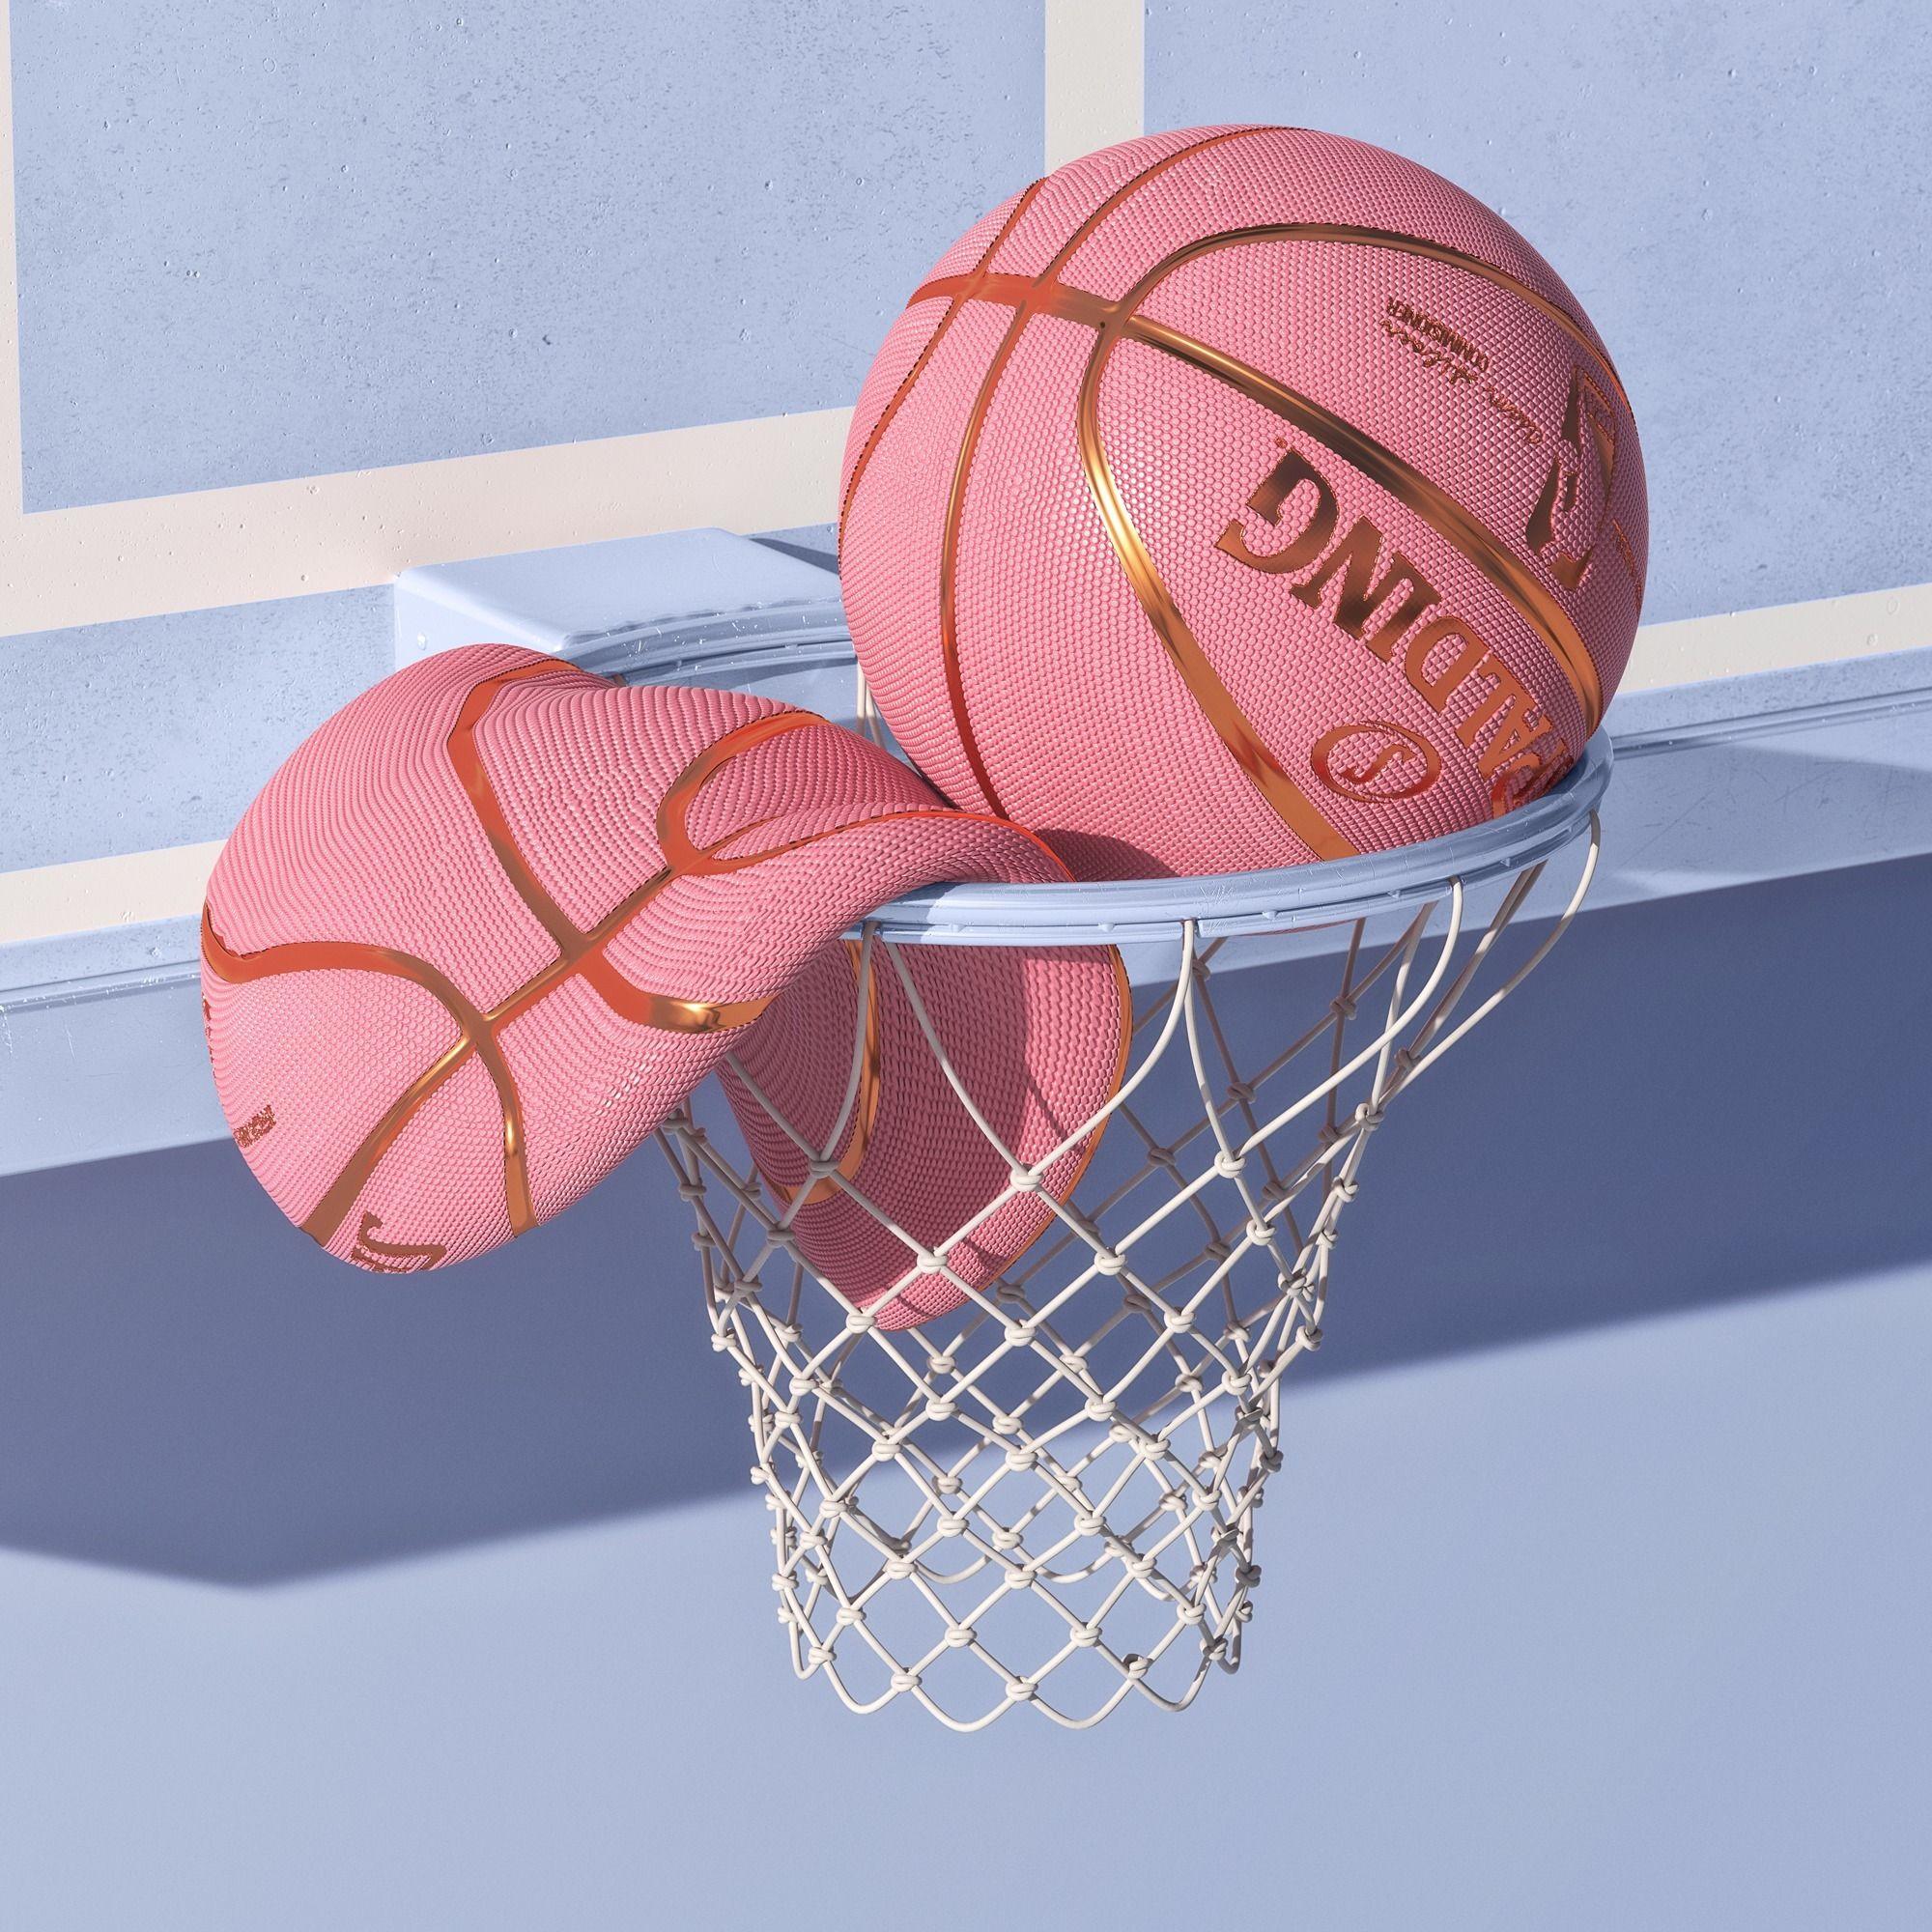 Ballgames By Philiplueck Ello 3d 3drendering Design Pink